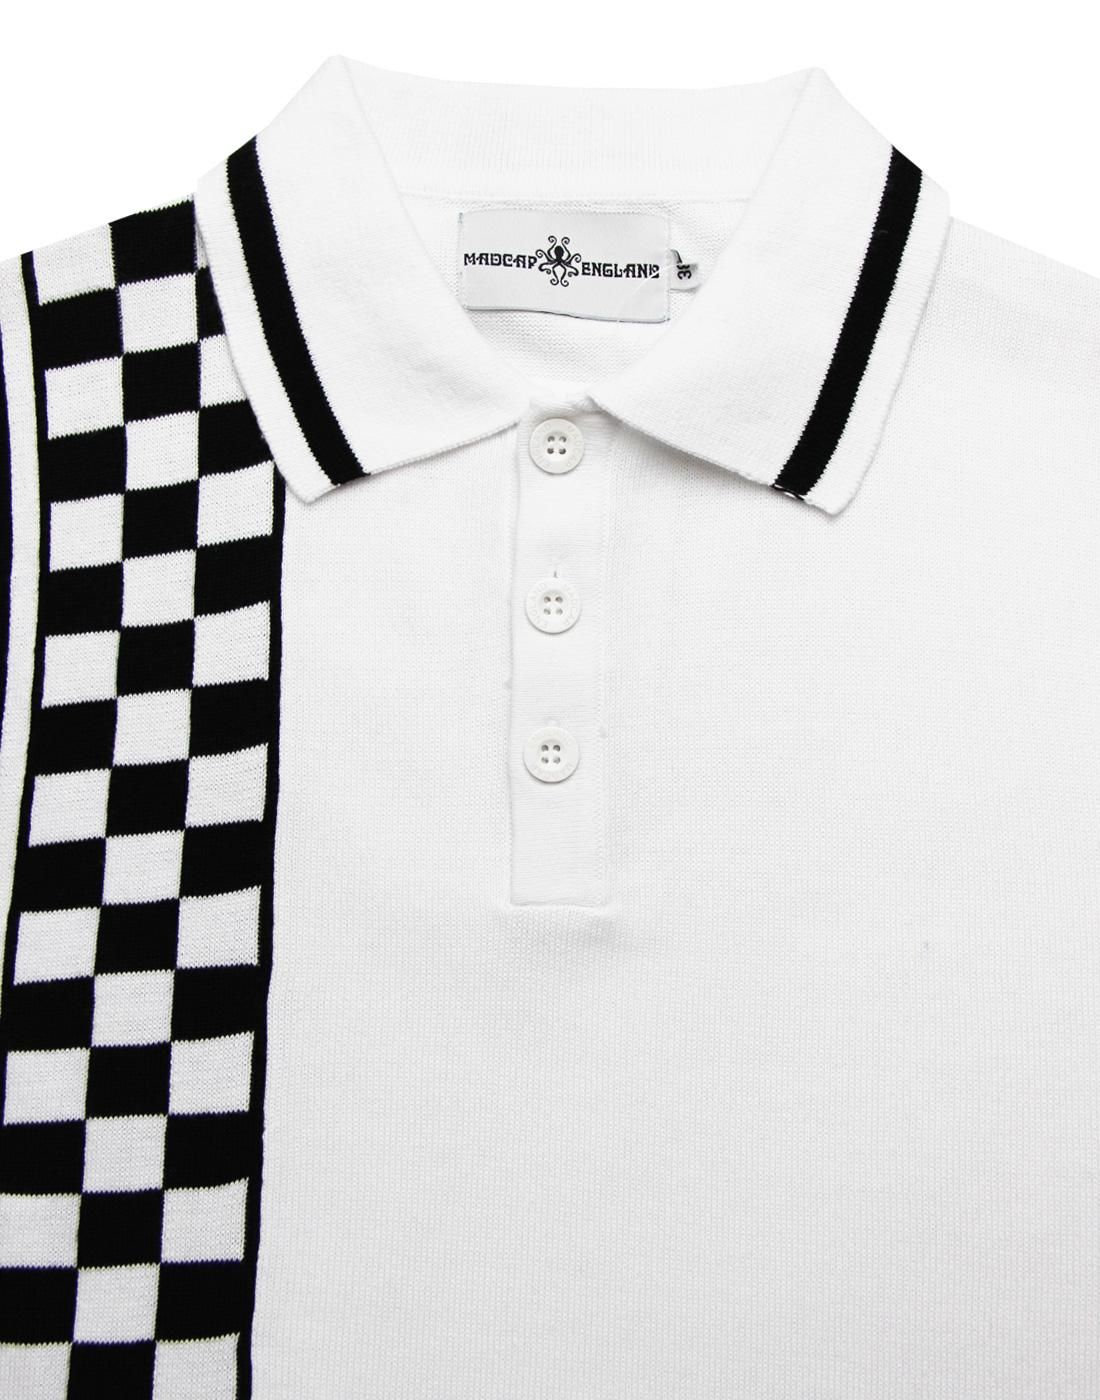 8223b9384 Maytal MADCAP ENGLAND Mod Ska Check Stripe Polo in 2019